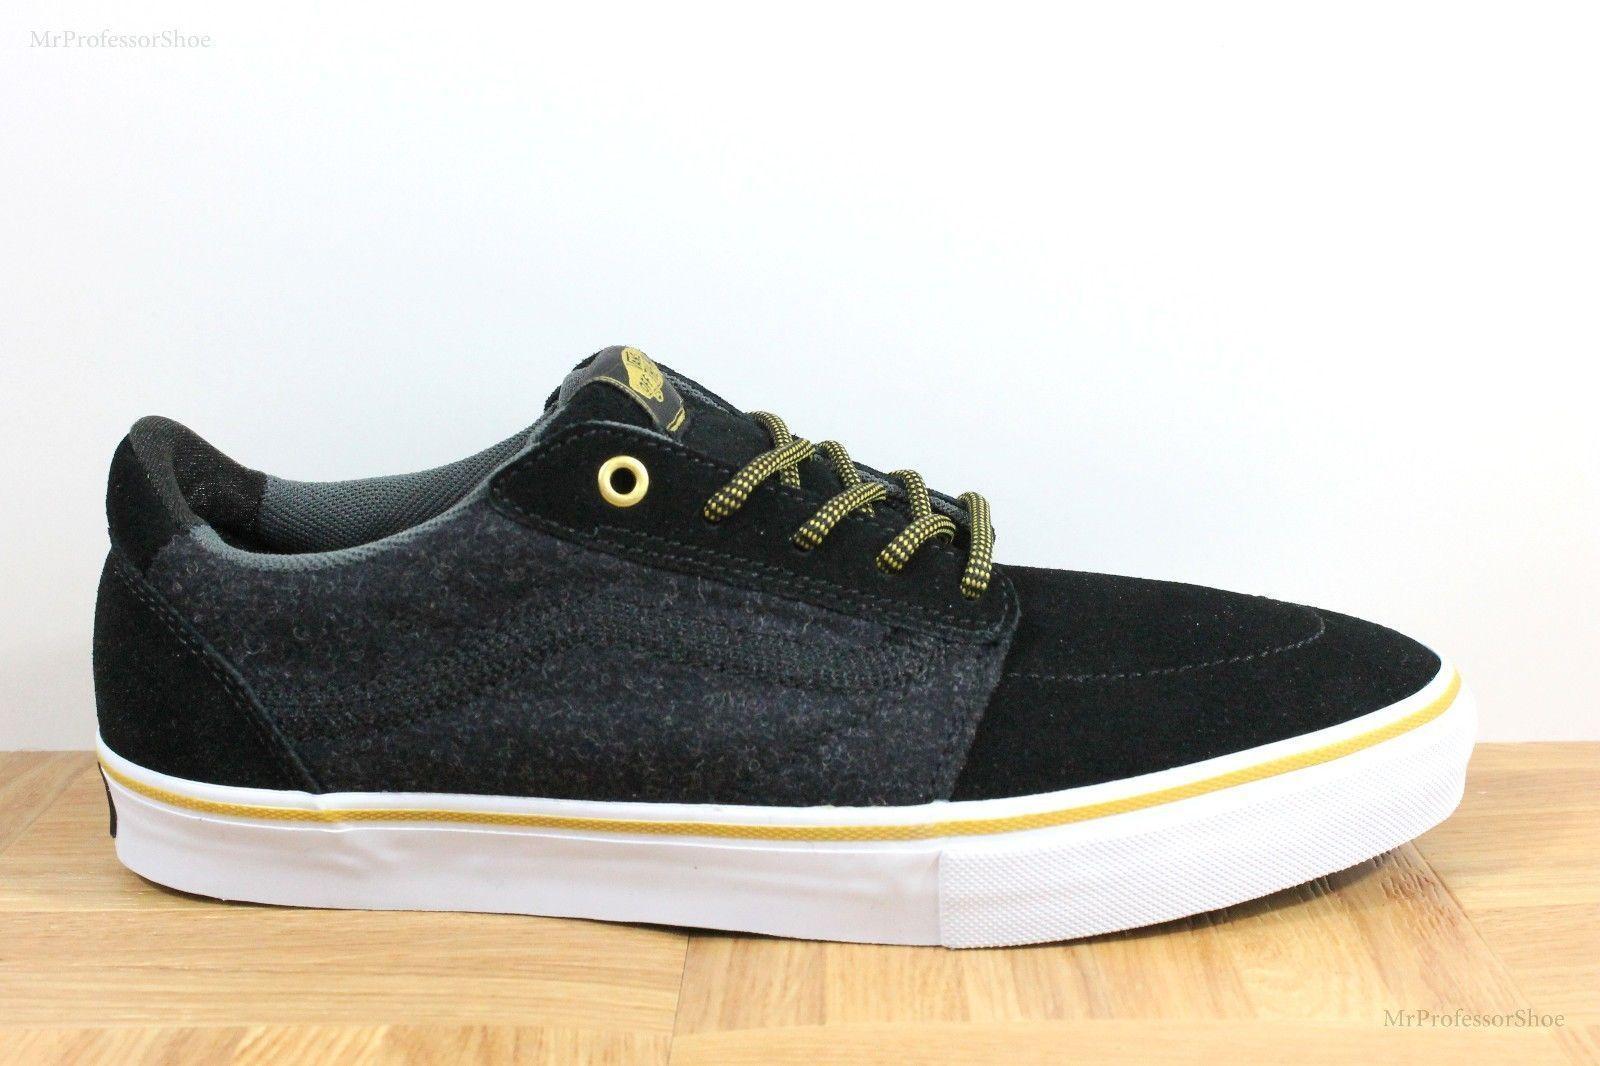 Vans Lindero (Wool) Black/Gold Skate Shoes MEN'S 7.5 WOMEN'S 9 image 2